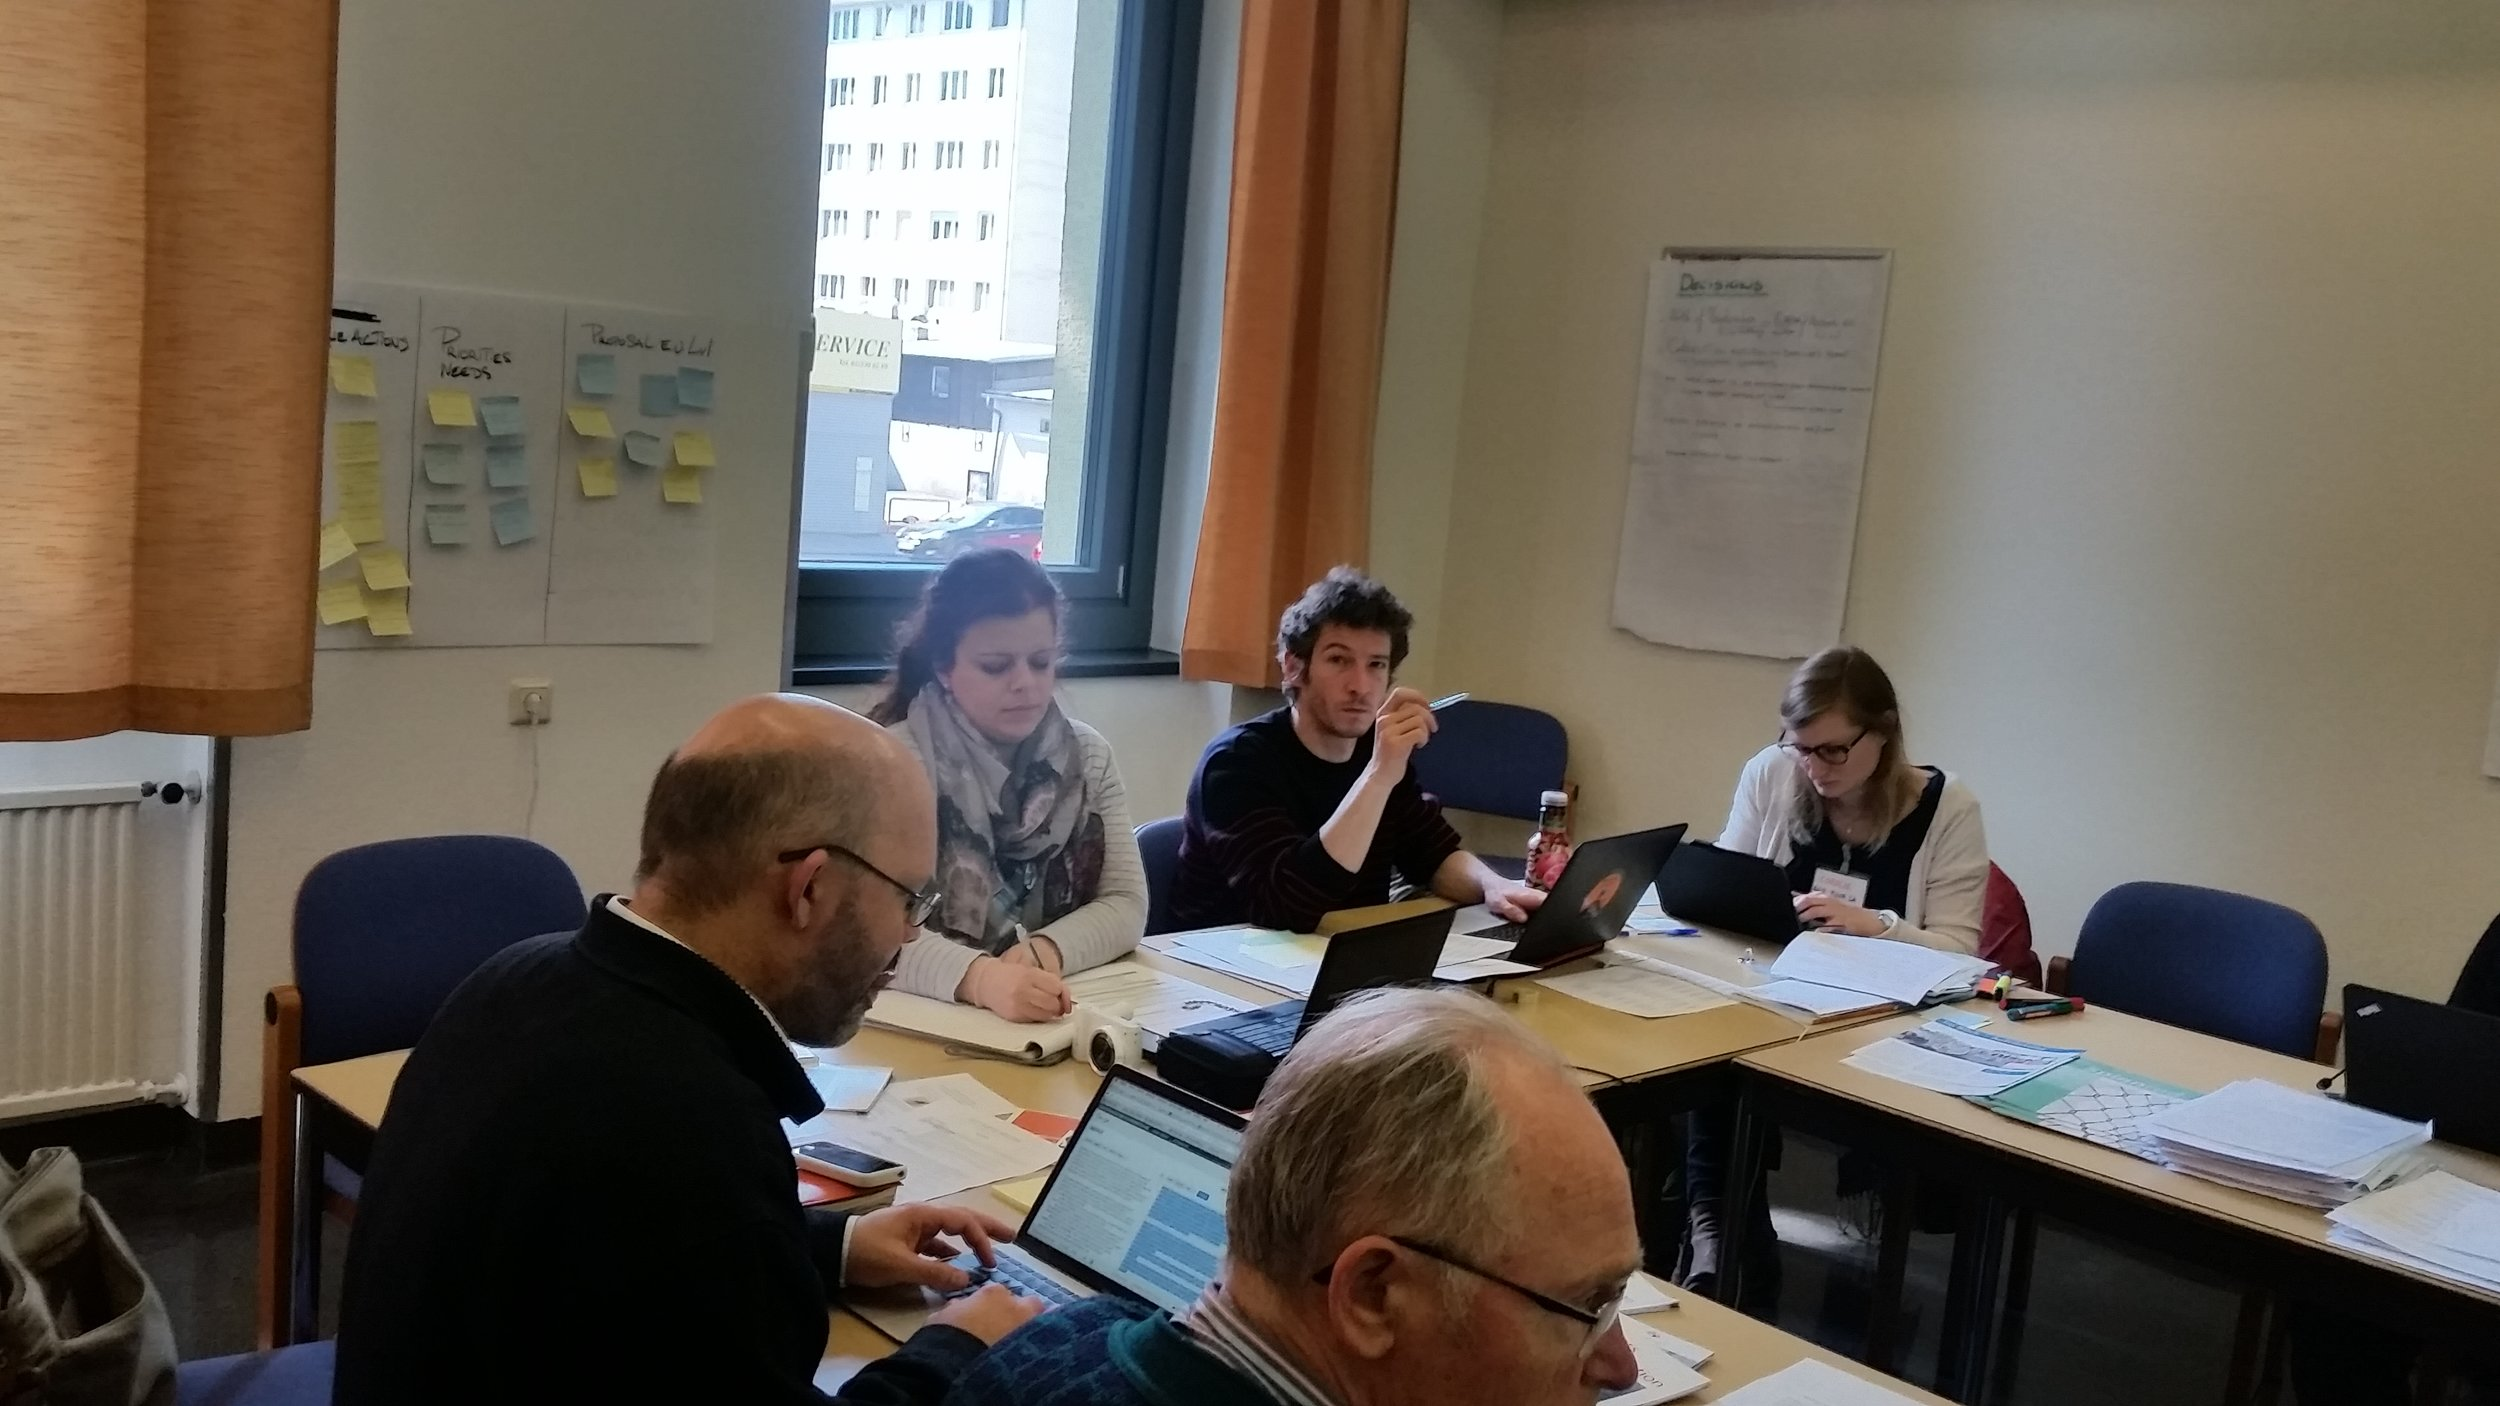 RCC Europe facilitated the meeting.